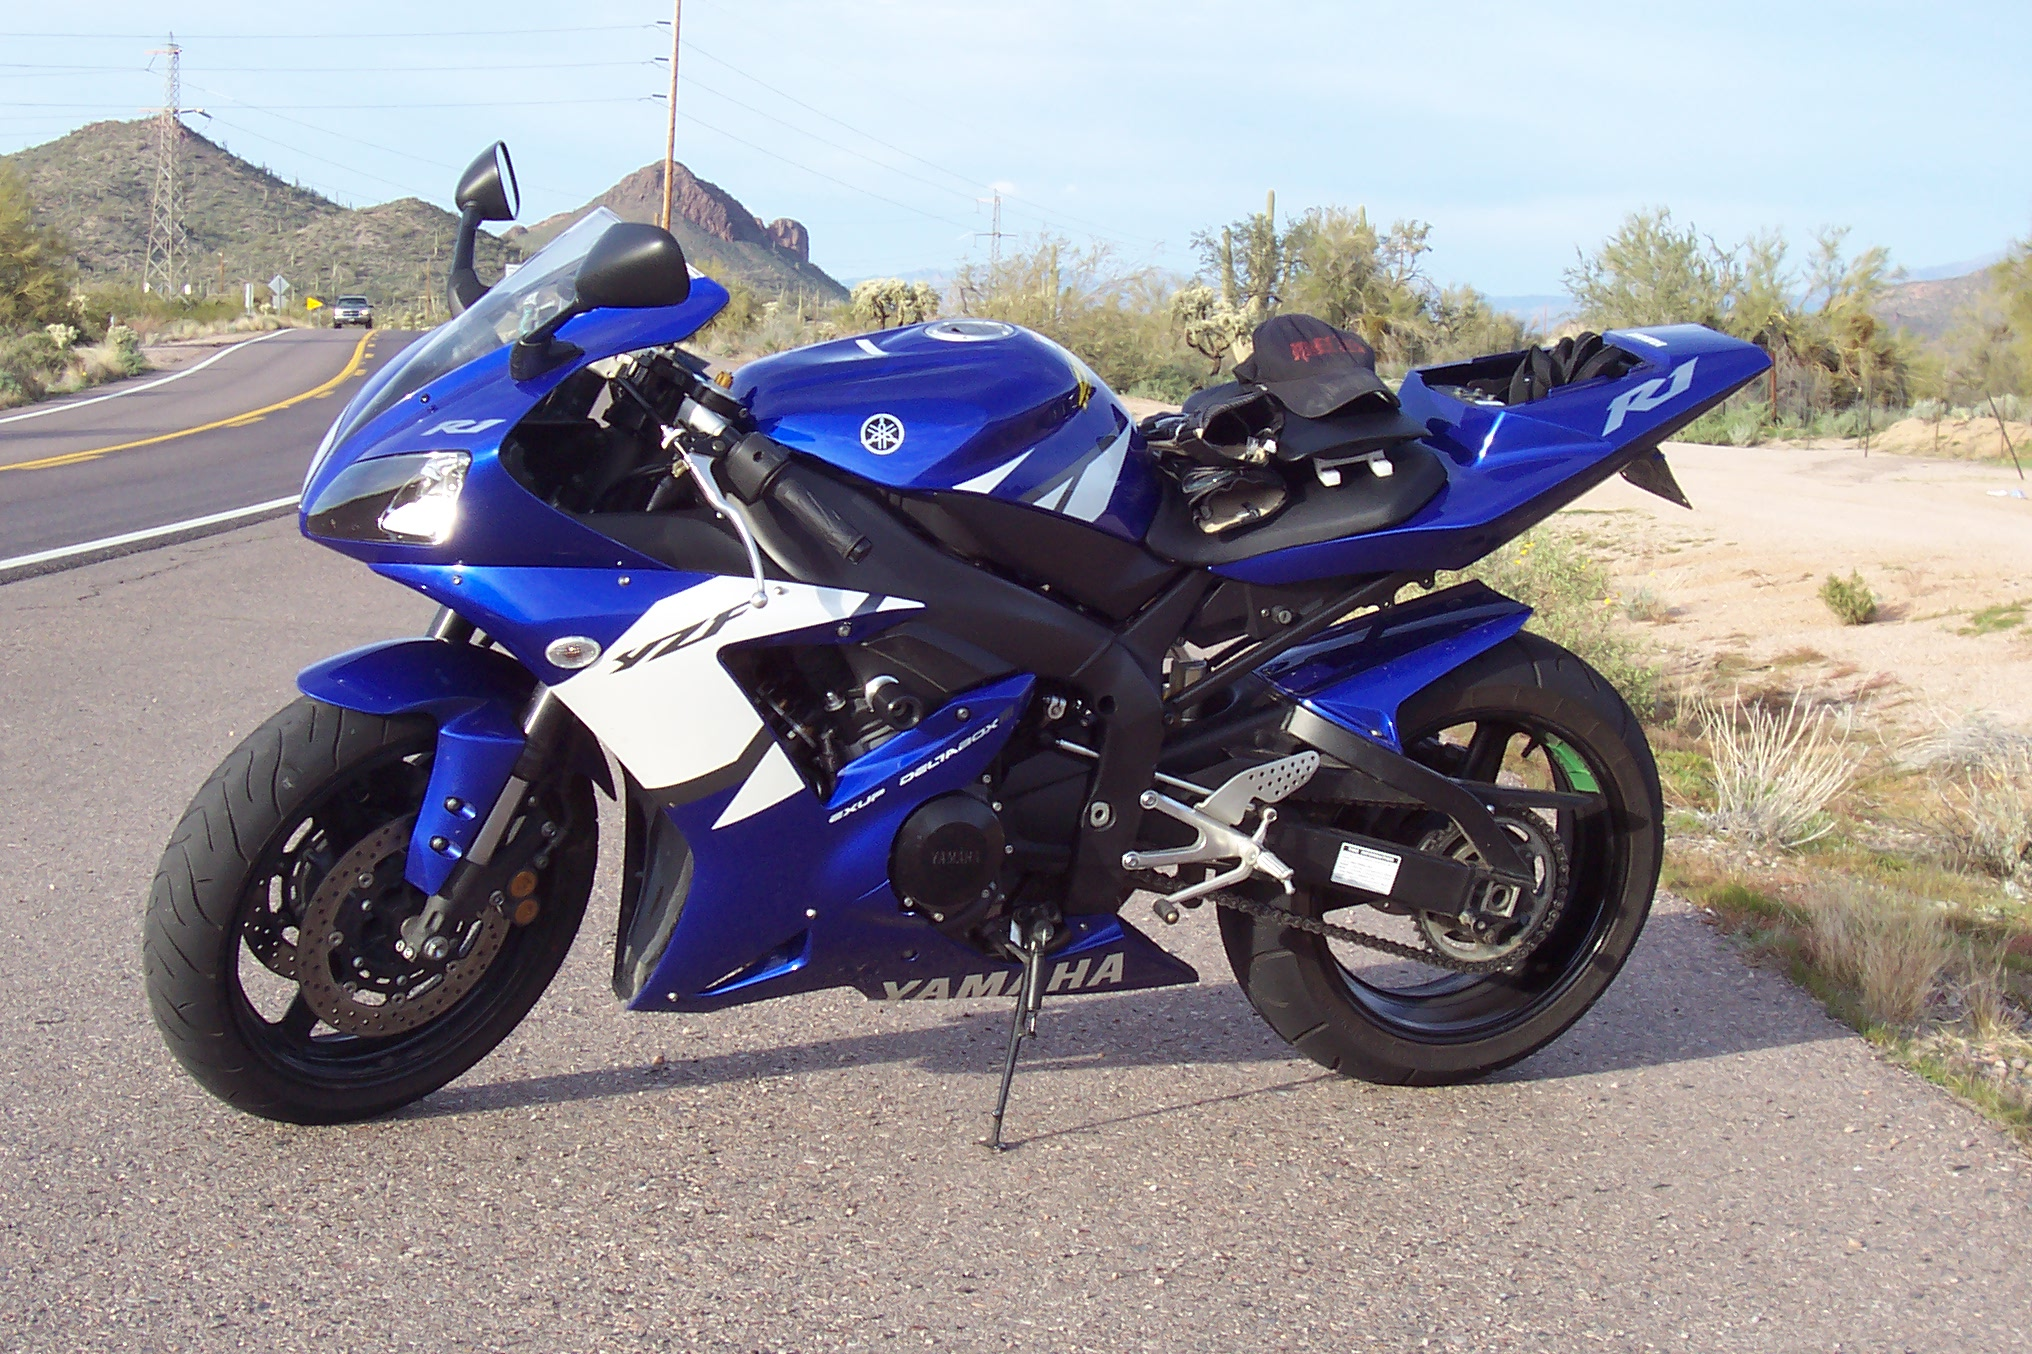 2002 Yamaha R1 Sportbikes Net